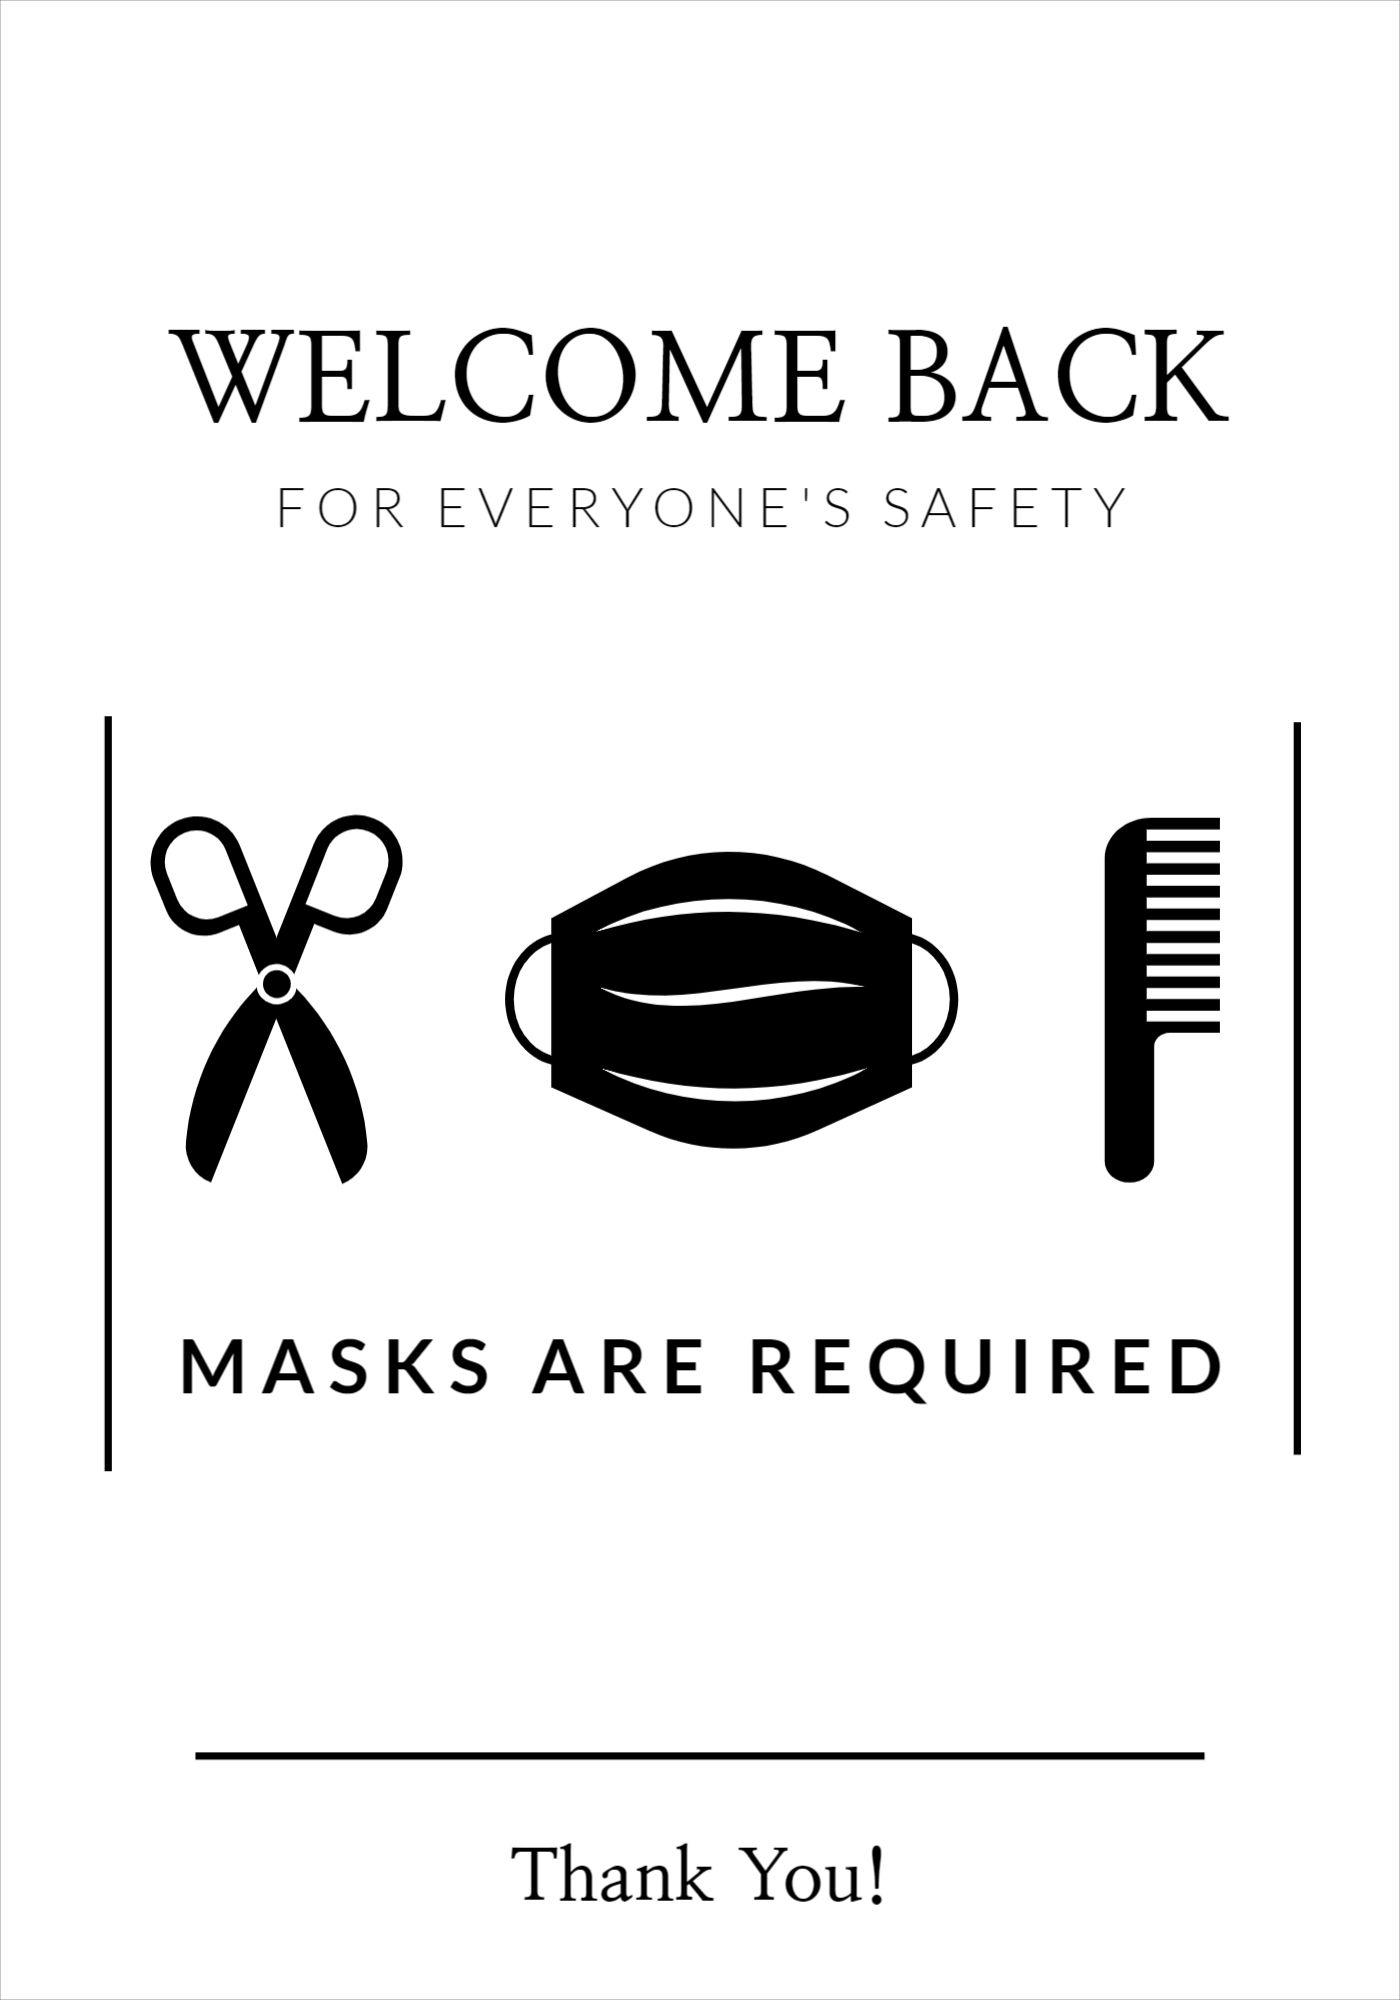 Hair Salon Mask Covid Poster Template